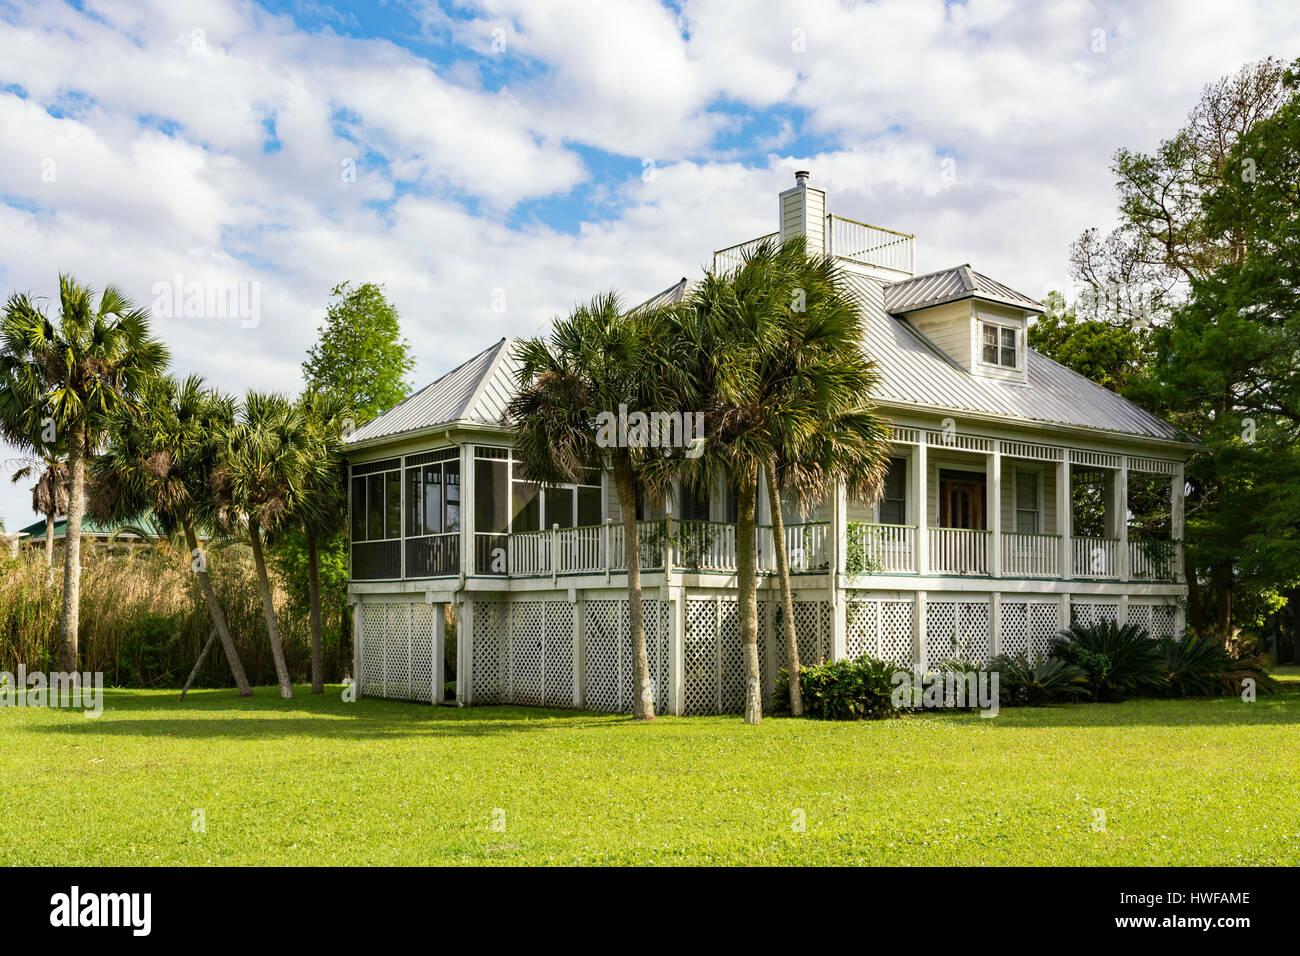 Florida, Apalachicola, private residence - Stock Image